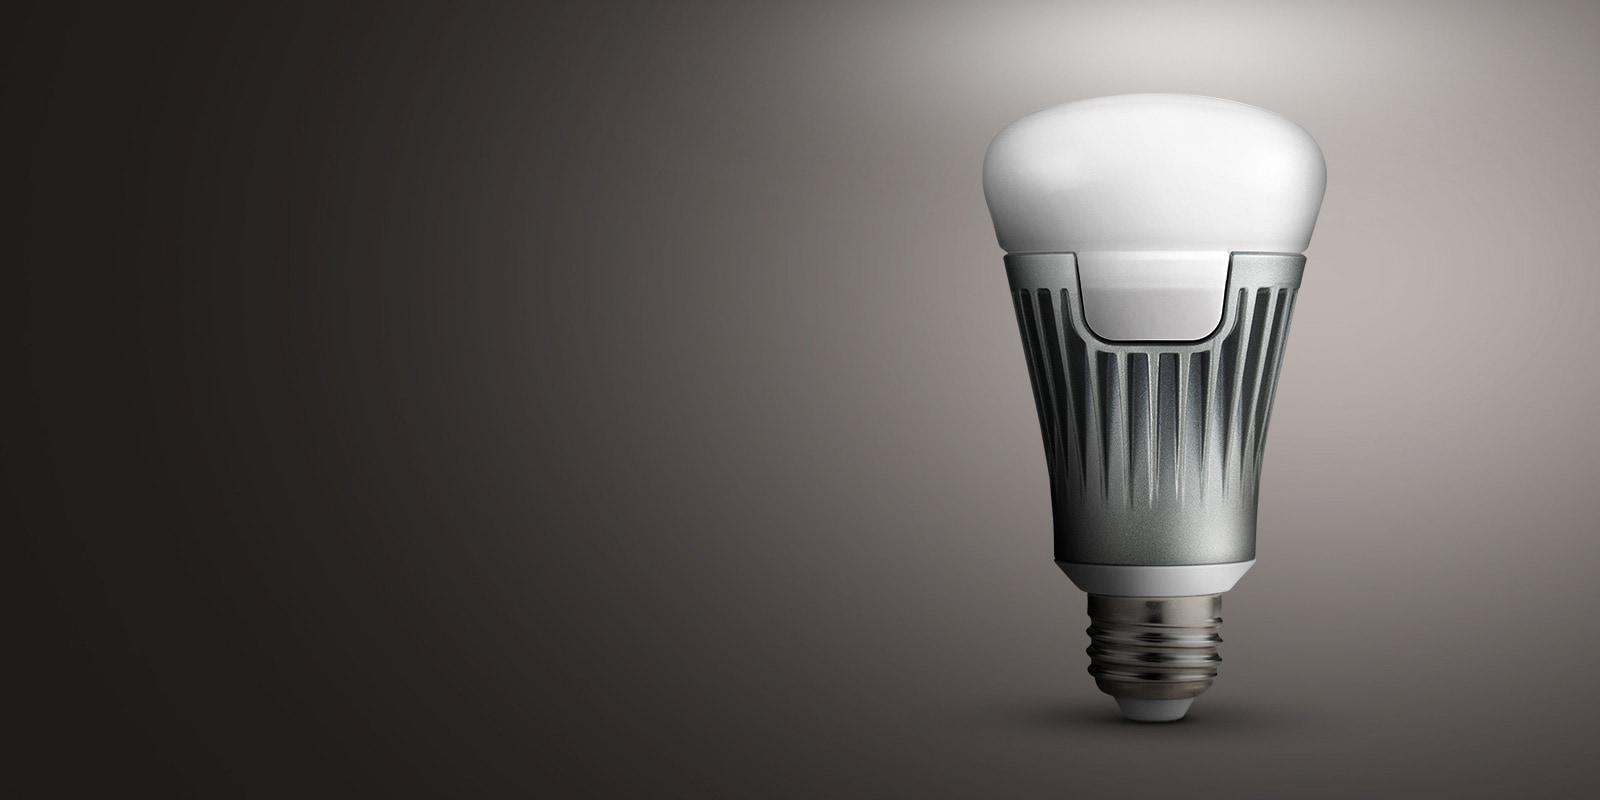 light tools bluetooth lightbulb tips a to on budget lighting led smart lights how mightlight